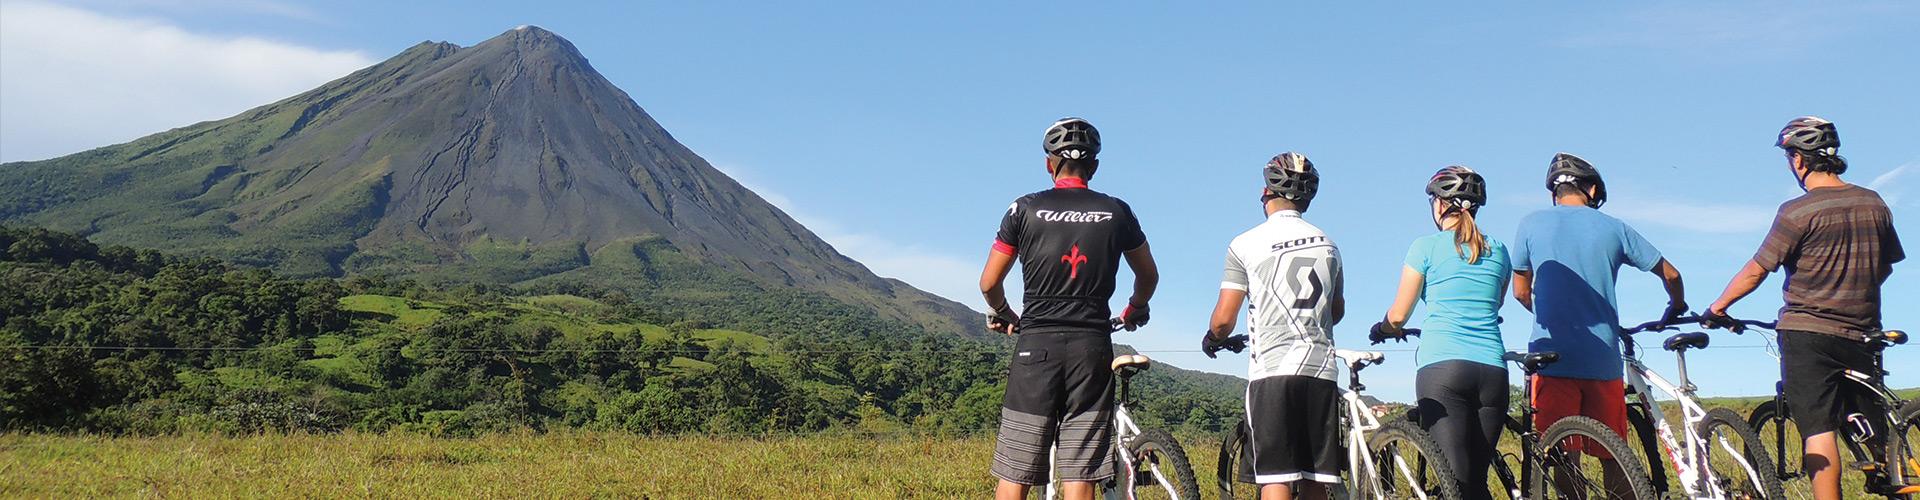 Cycle Nicaragua, Costa Rica & Panama 2019